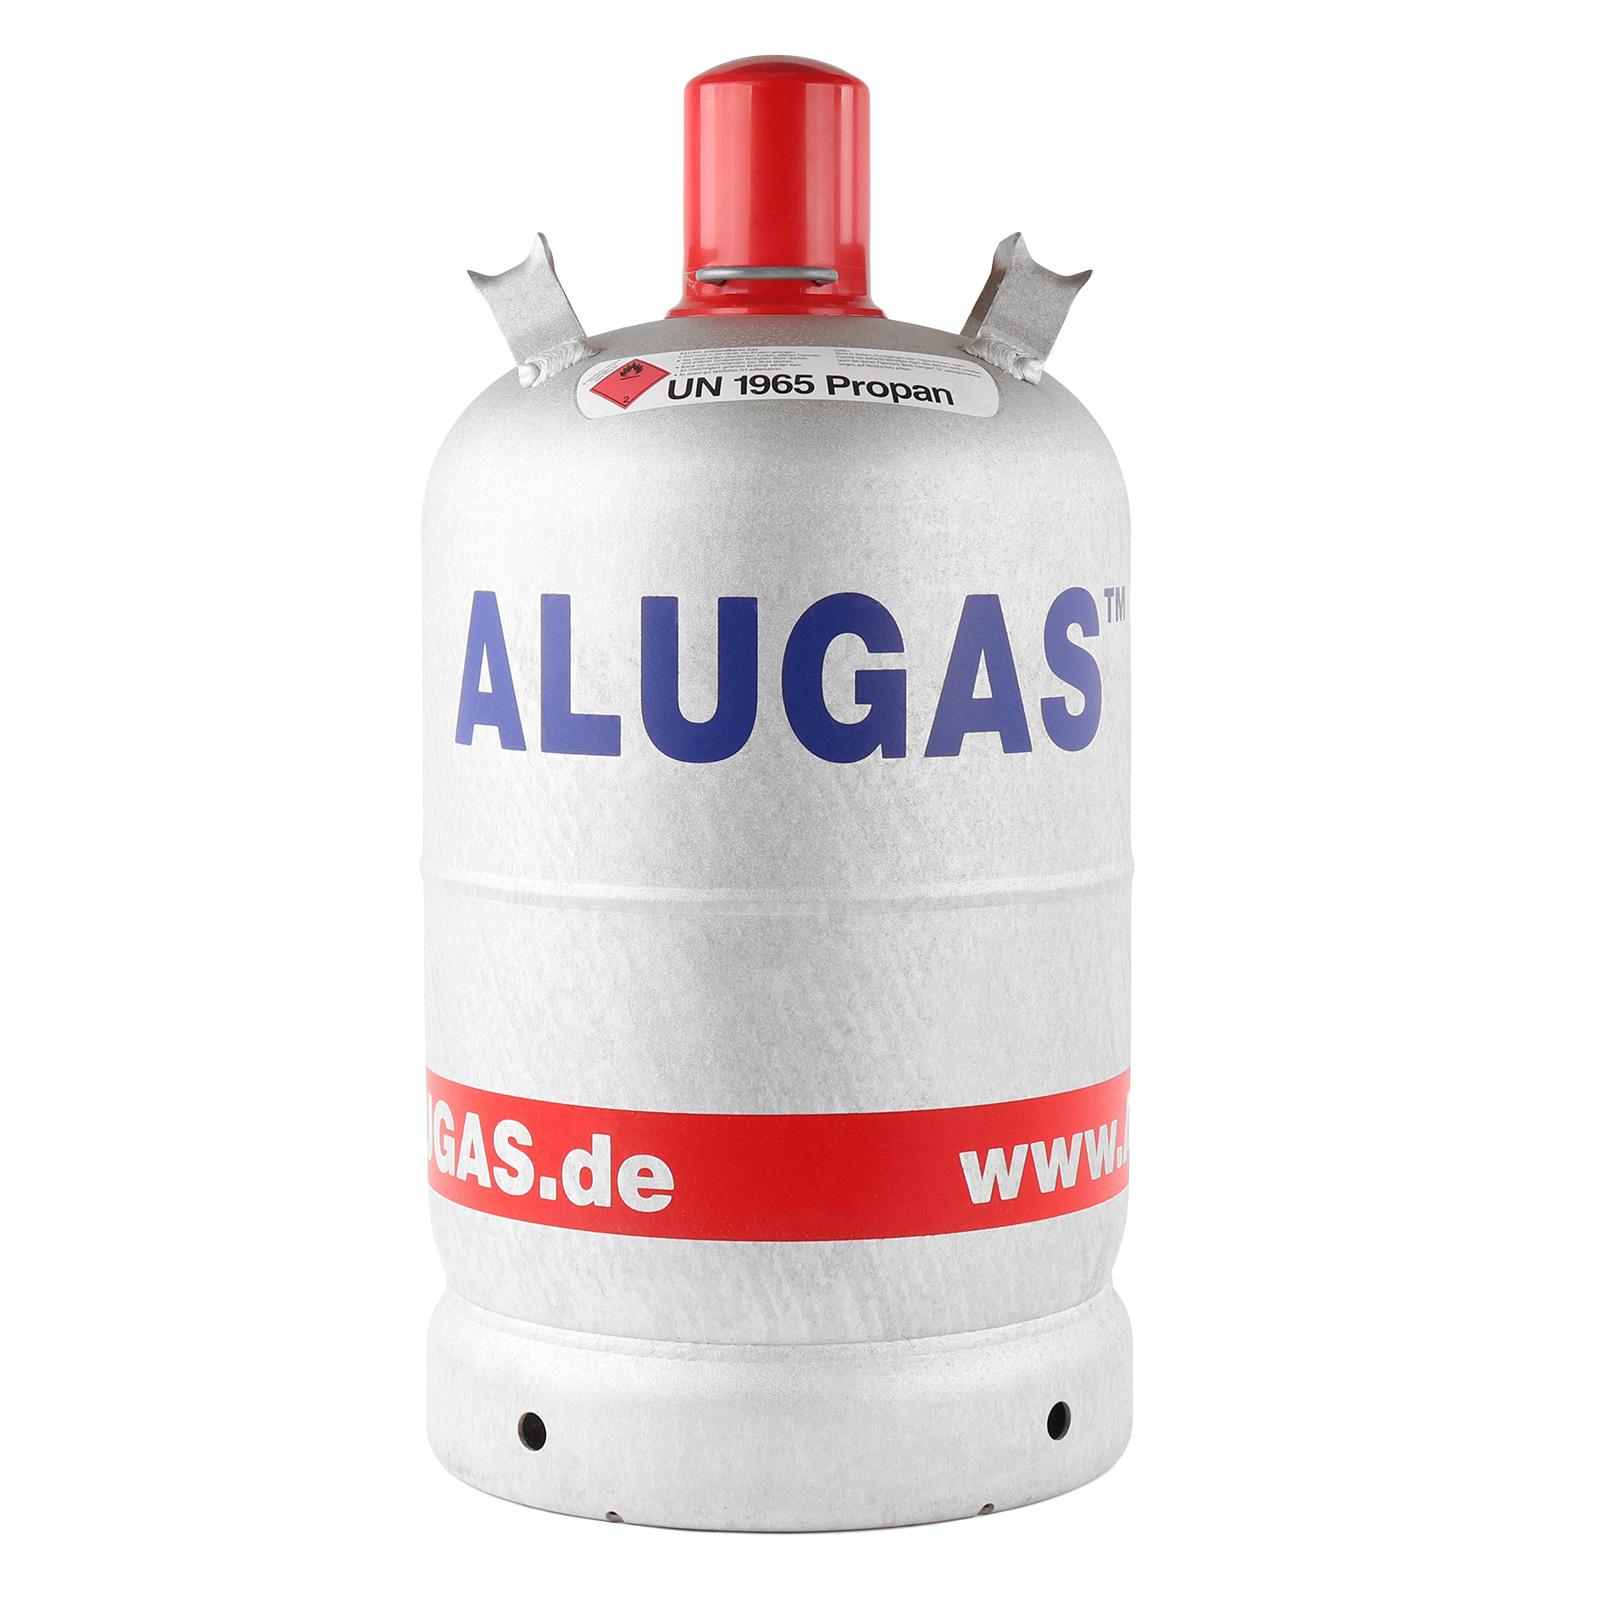 AluGas 11 Kg Propangas, Gasflasche für Camping NEU leer